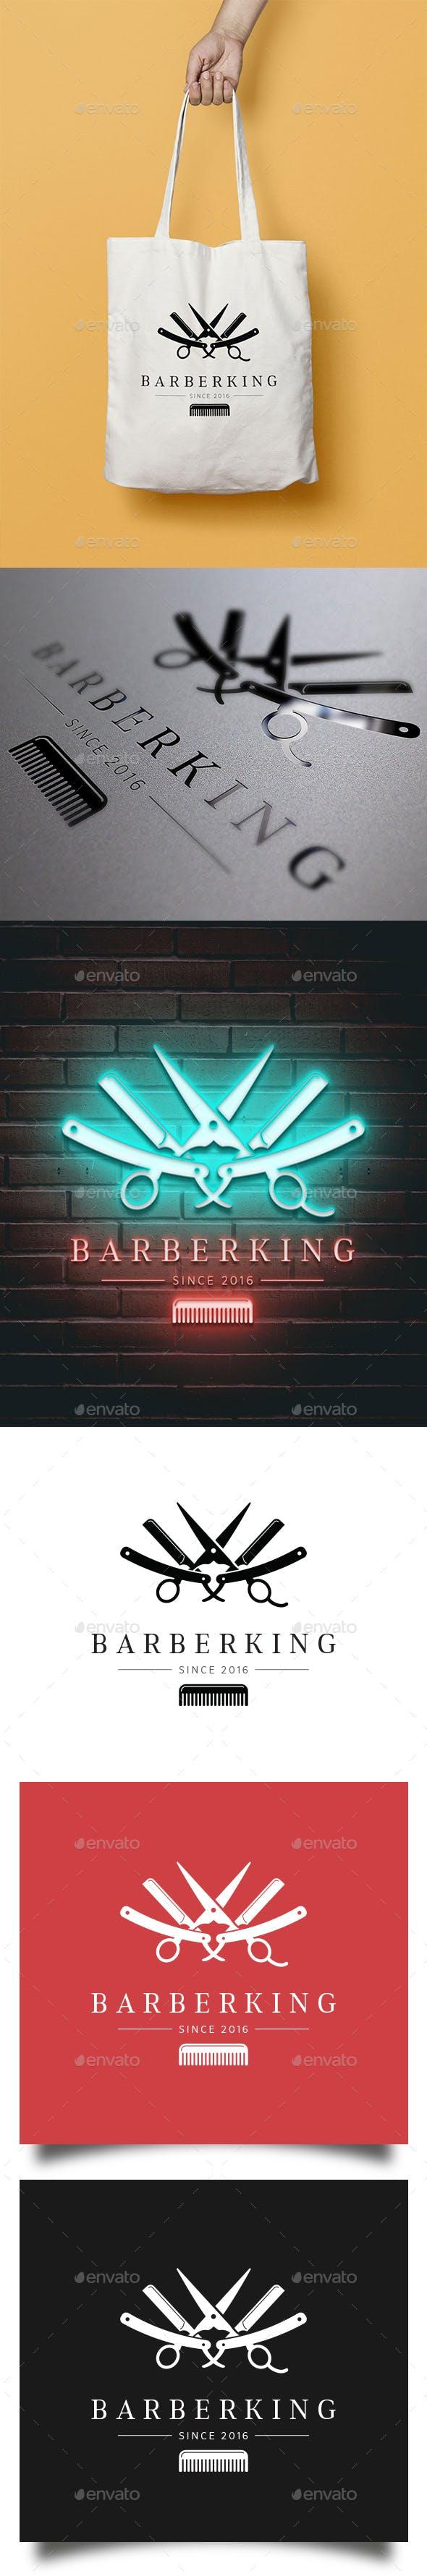 Дизайн логотипа Барбершопа для визитки